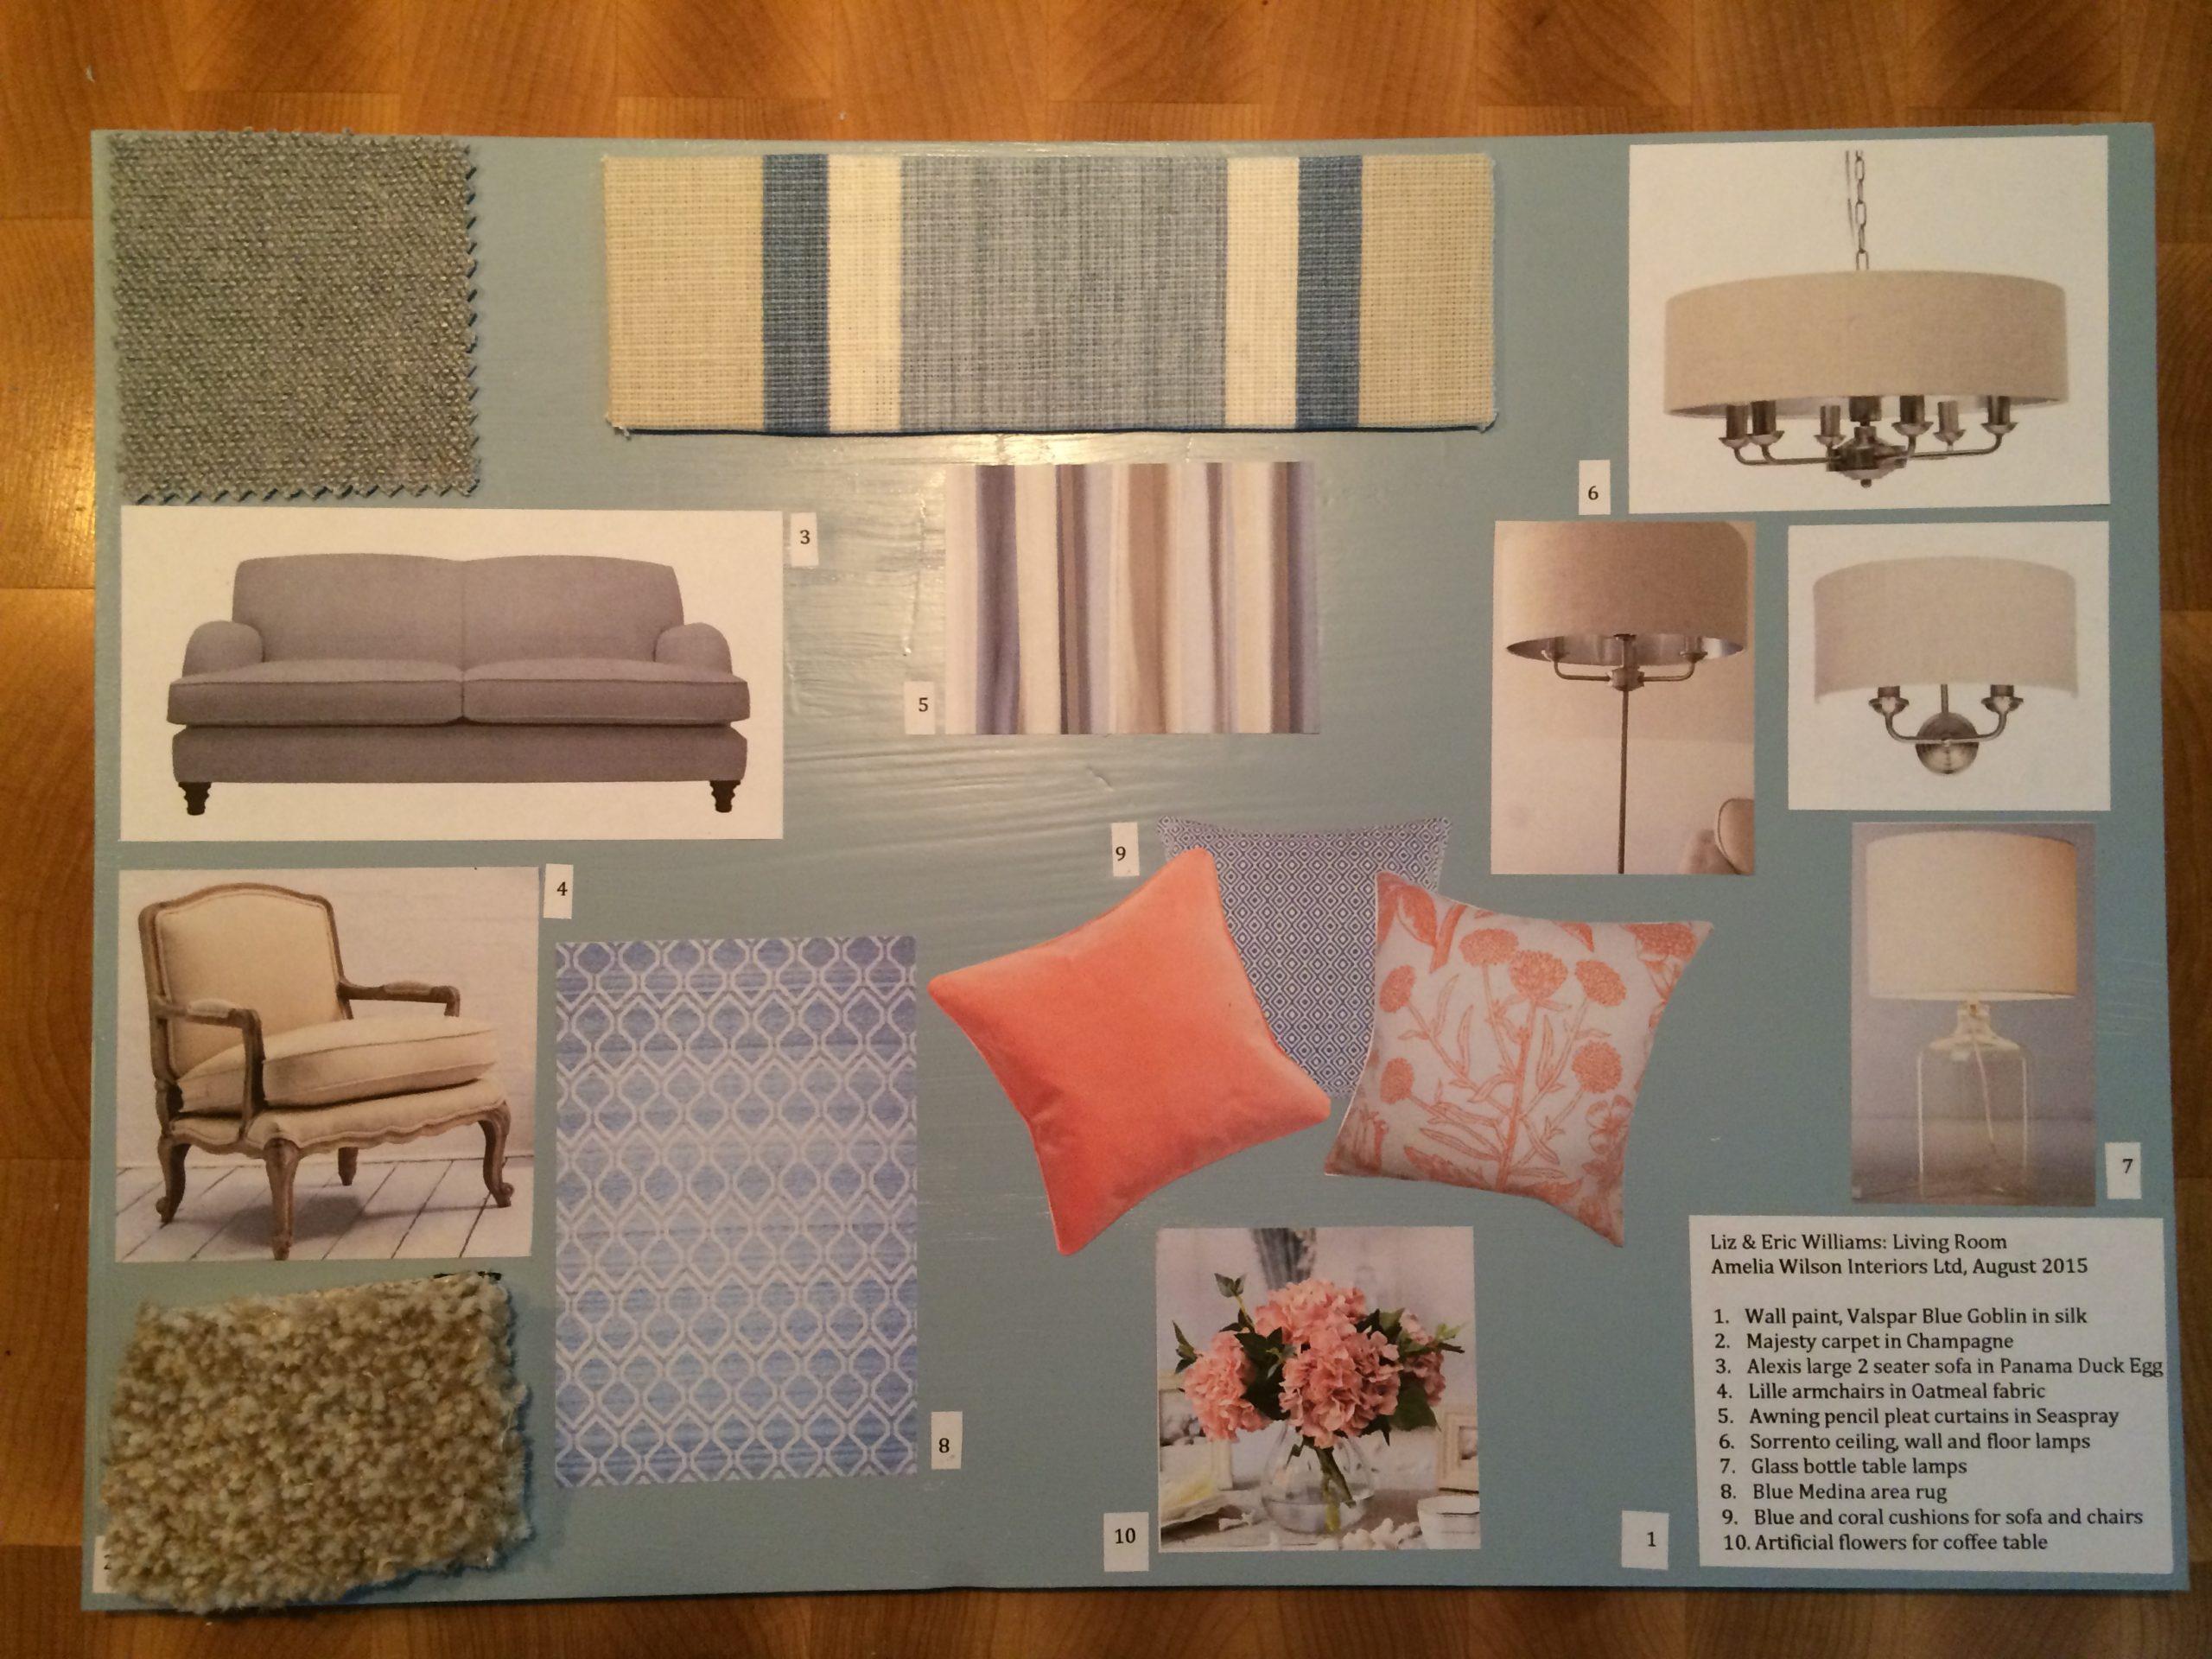 Living room mood board by Amelia Wilson Interiors Ltd